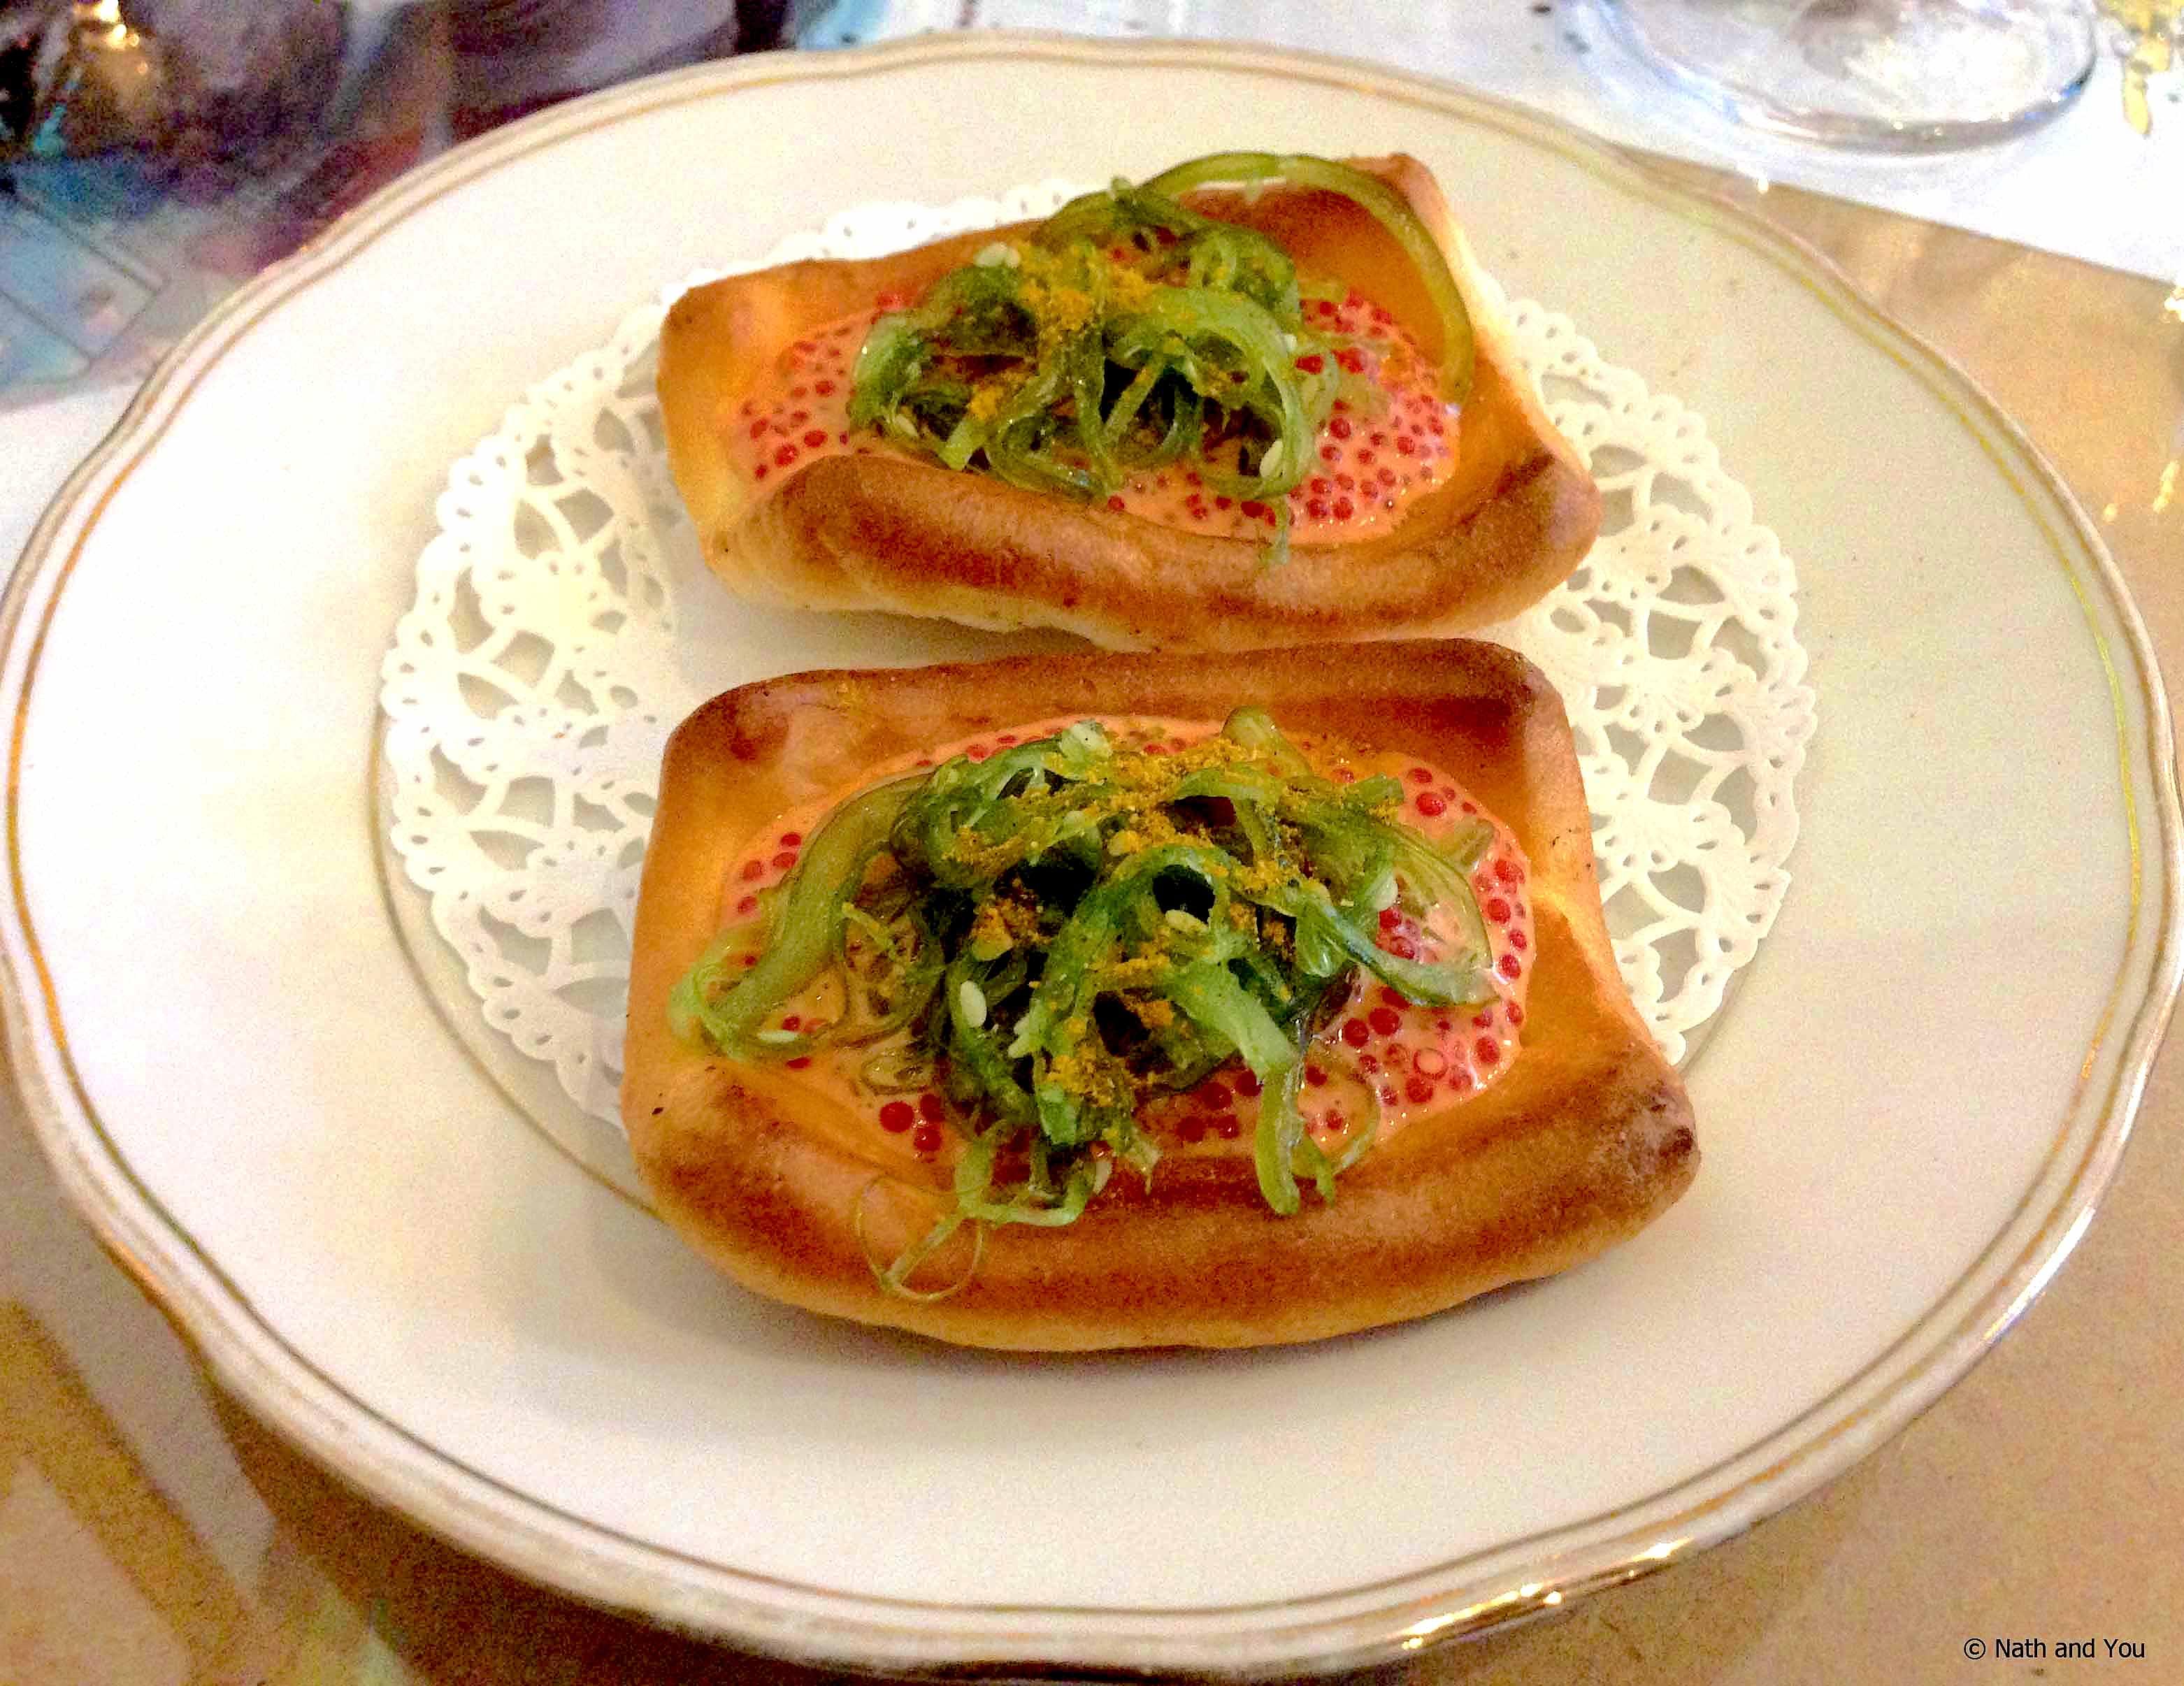 Canape oeufs de lompe restaurant coquille d oeuf saint for Canape restaurant